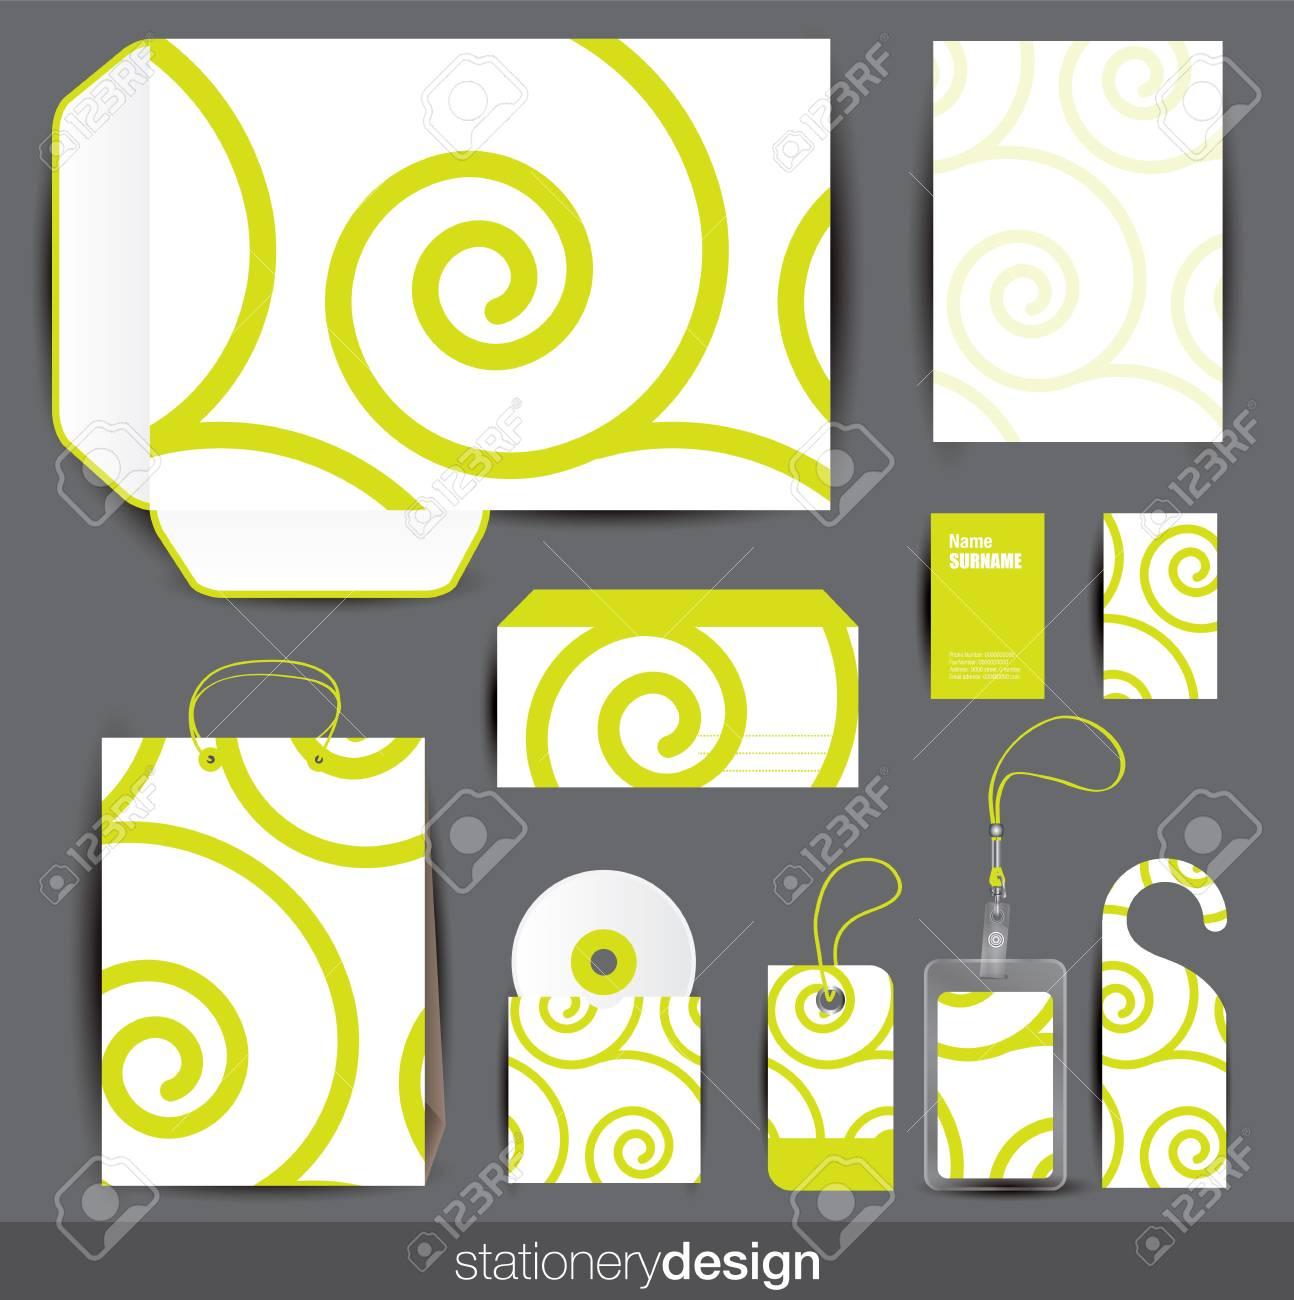 Stationery design set Stock Vector - 16439190